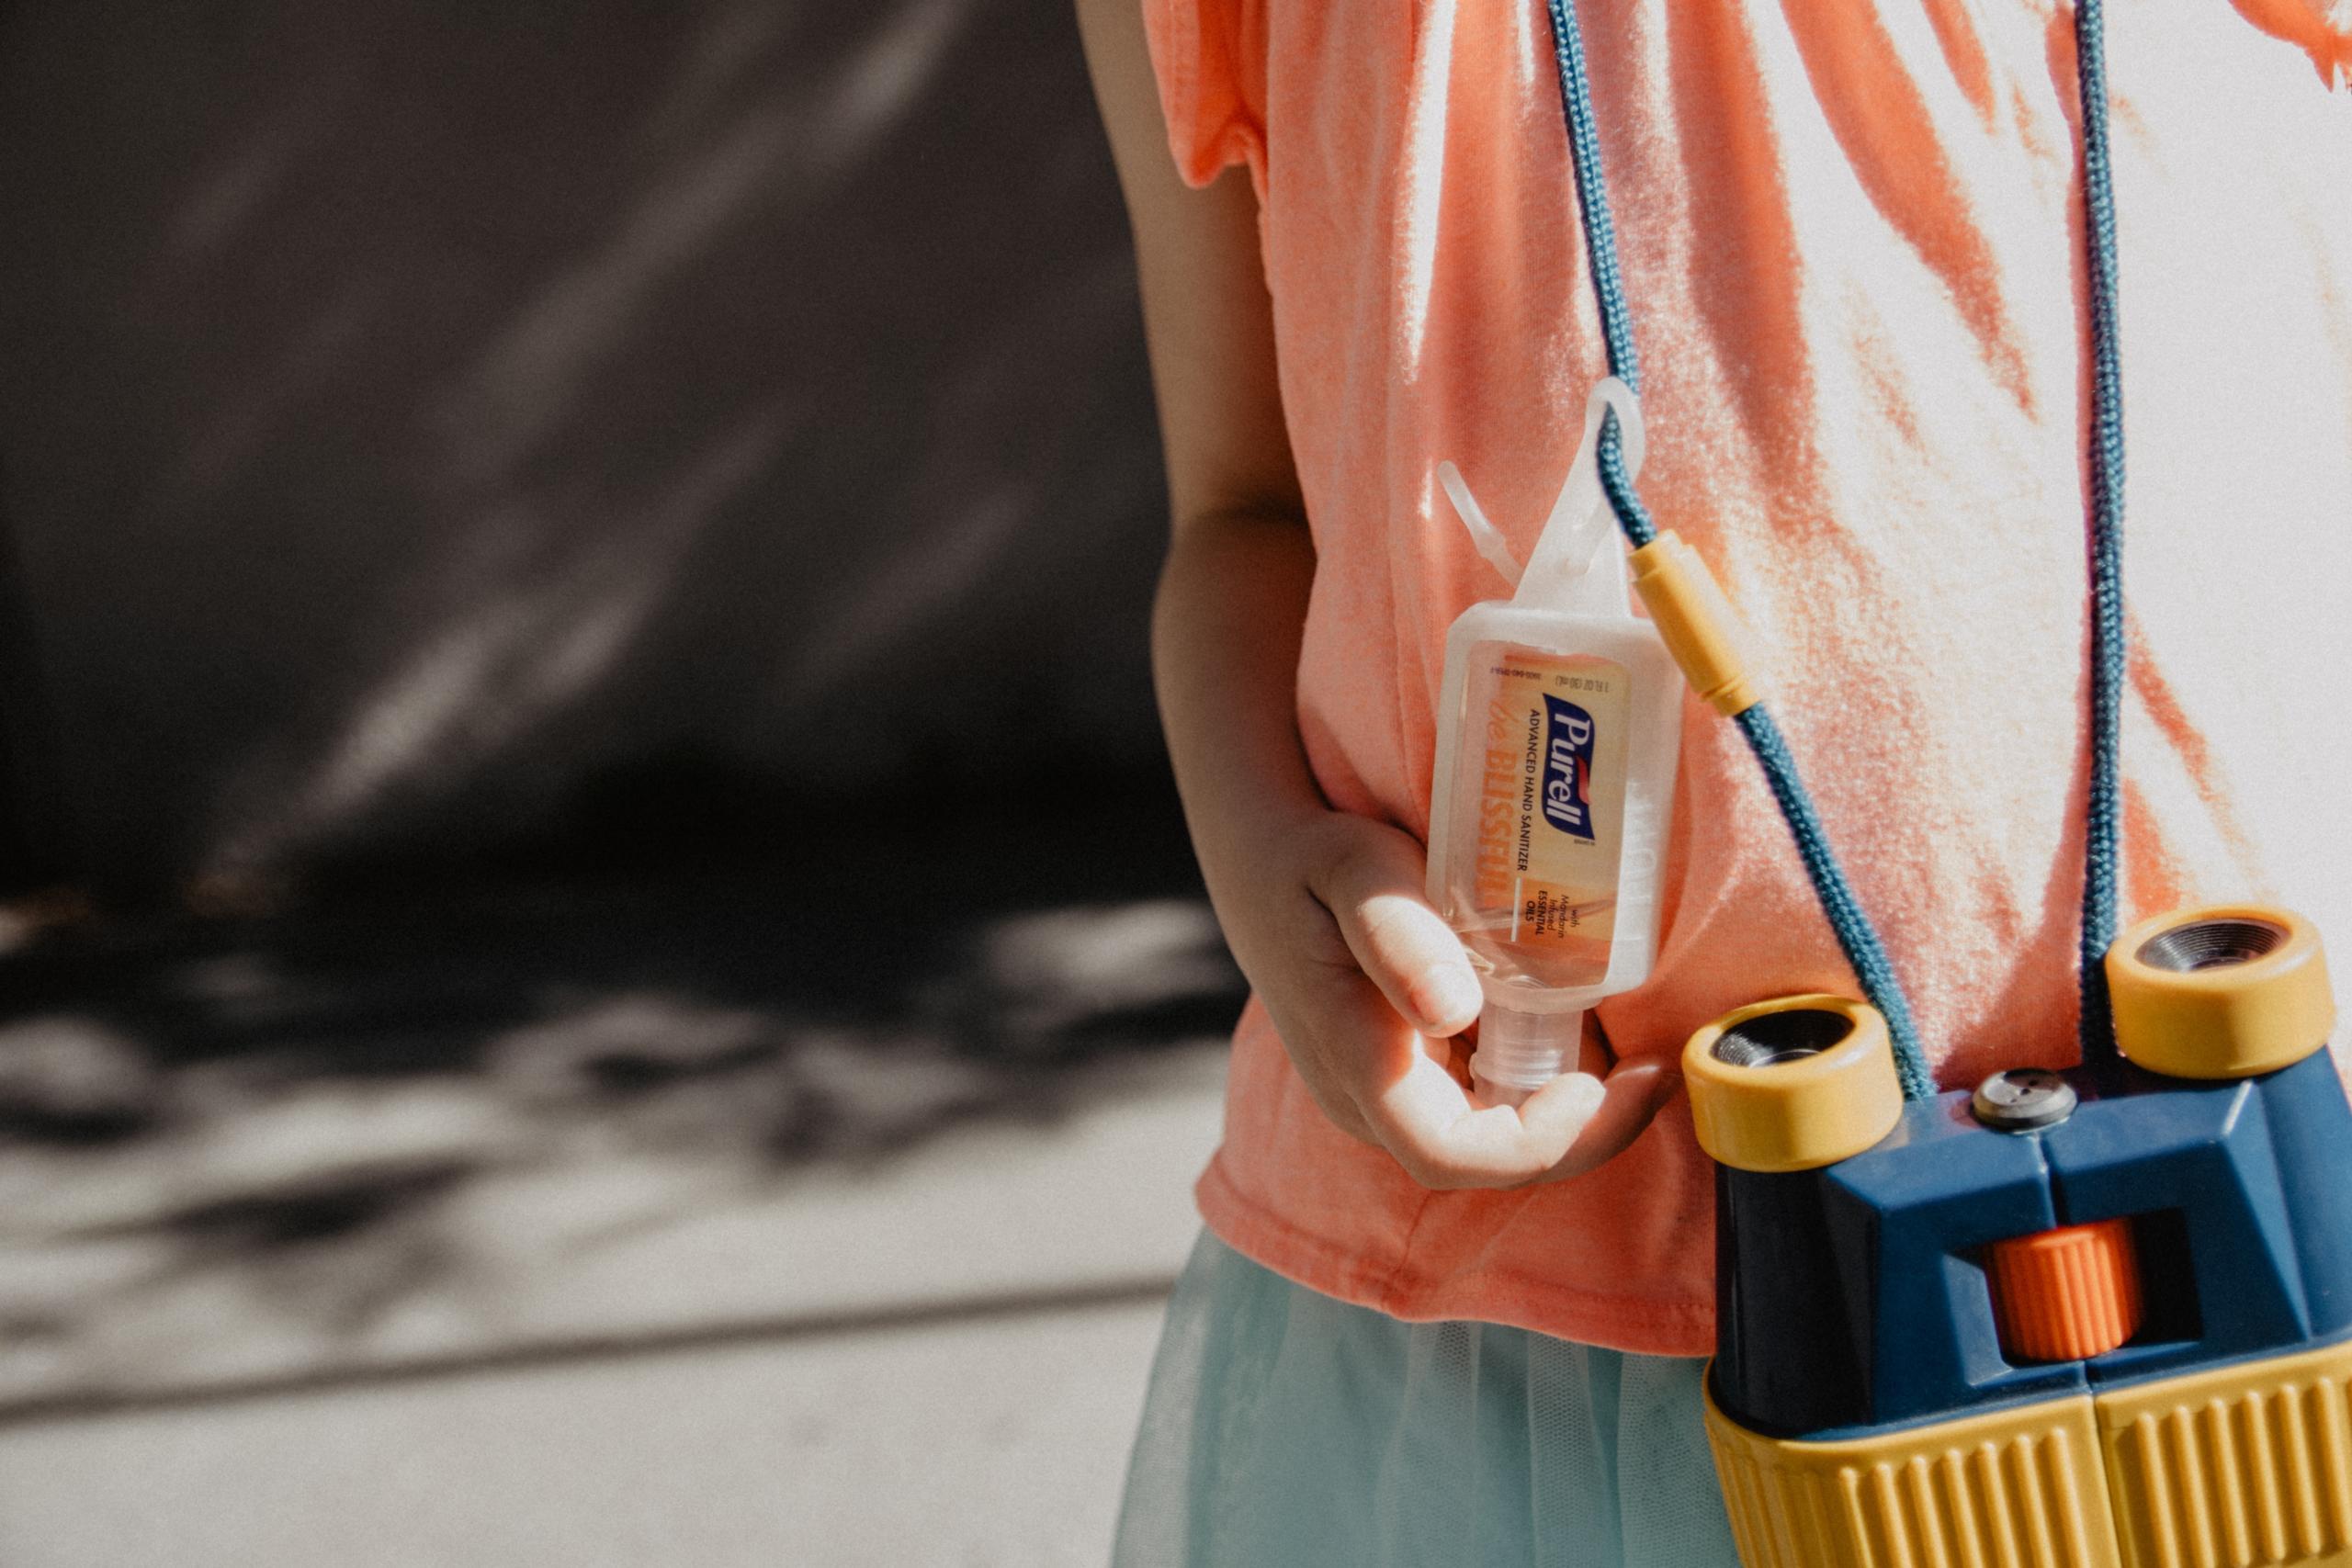 child with sanitiser